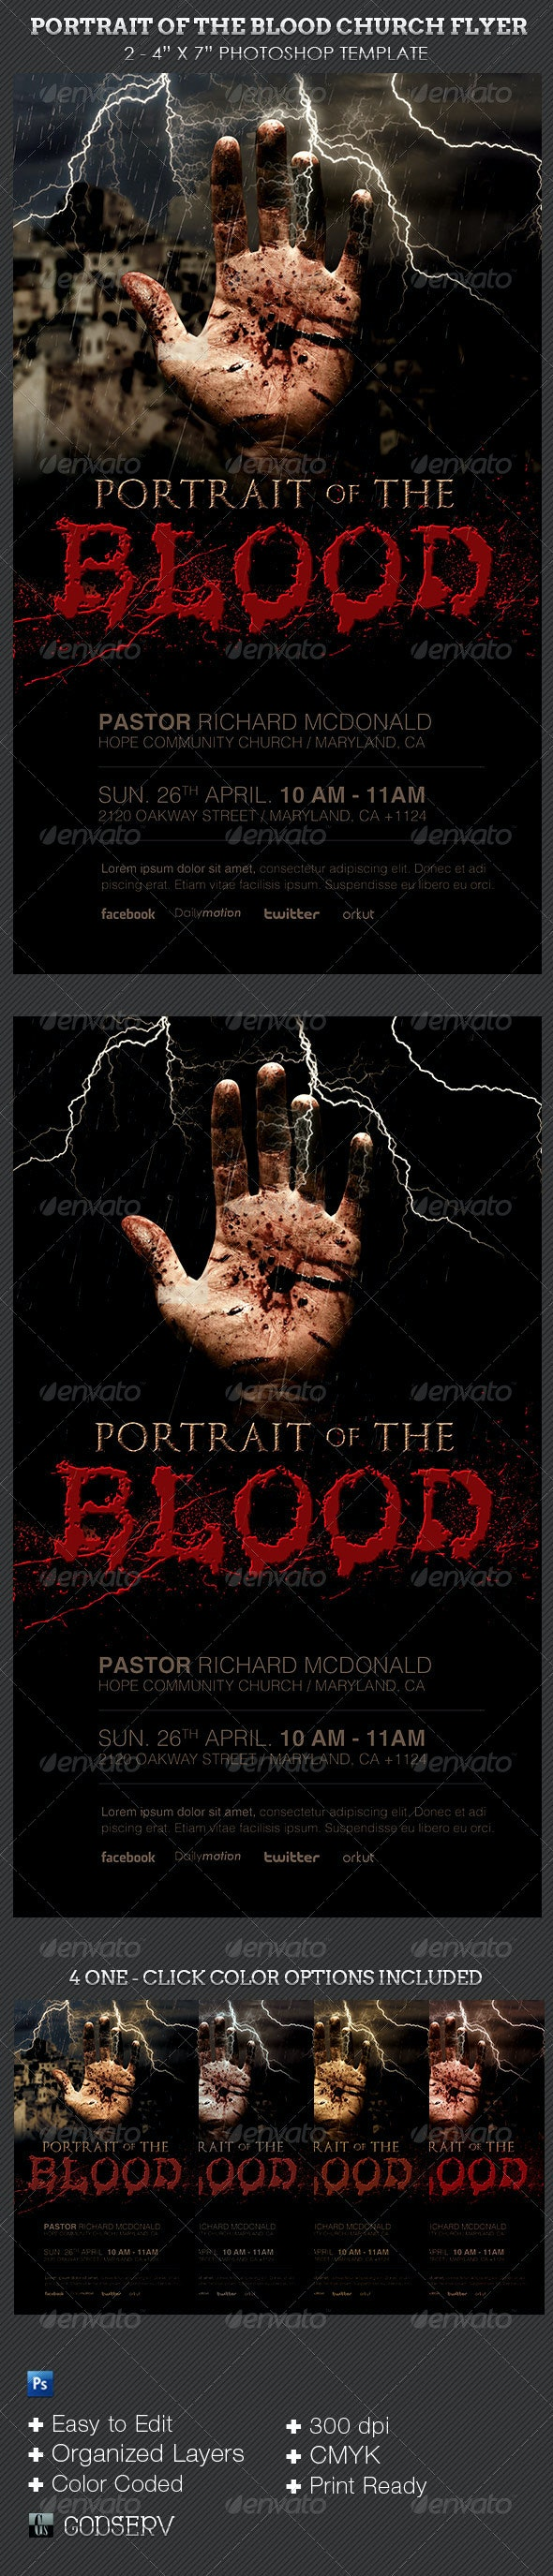 Blood Portrait Church Flyer Template - Church Flyers